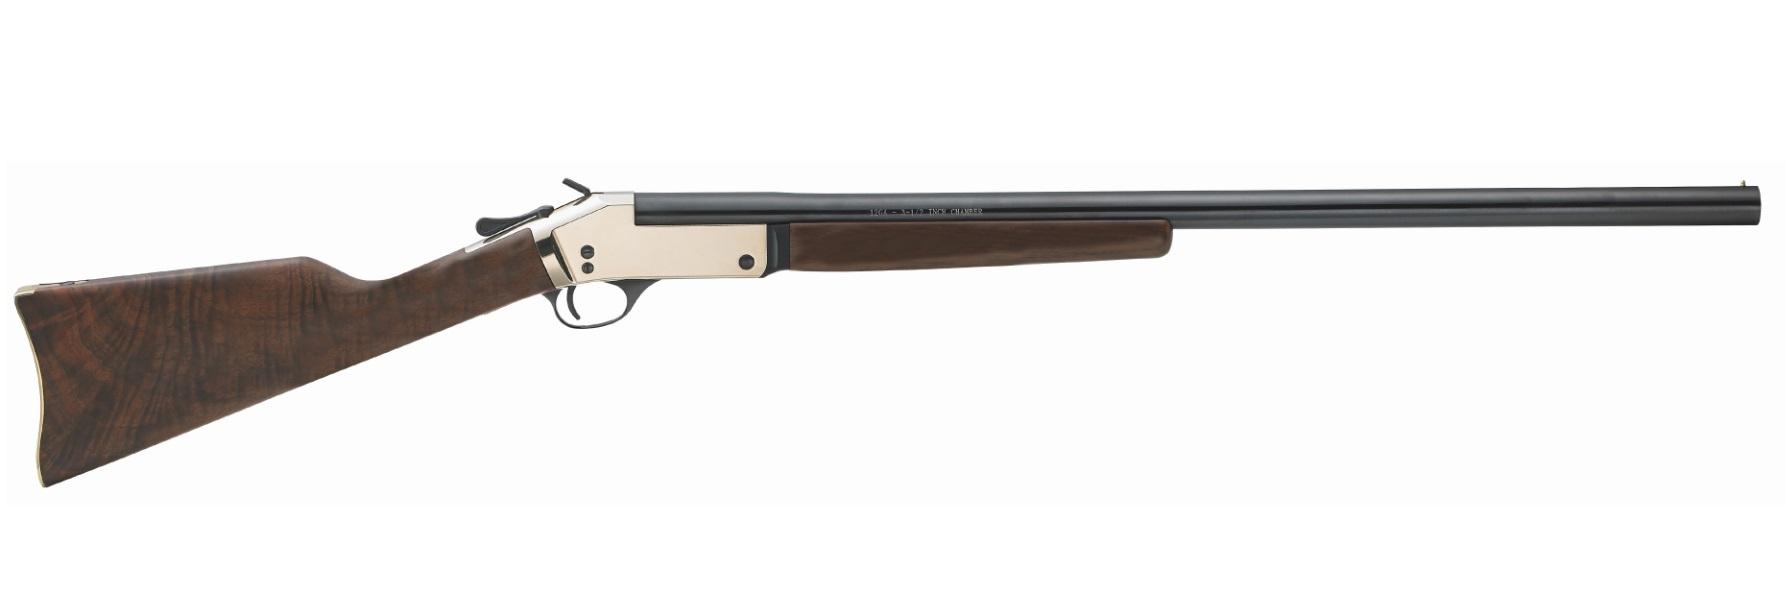 Henry Repeating Arms Henry Singleshot Shotgun 20 Gauge